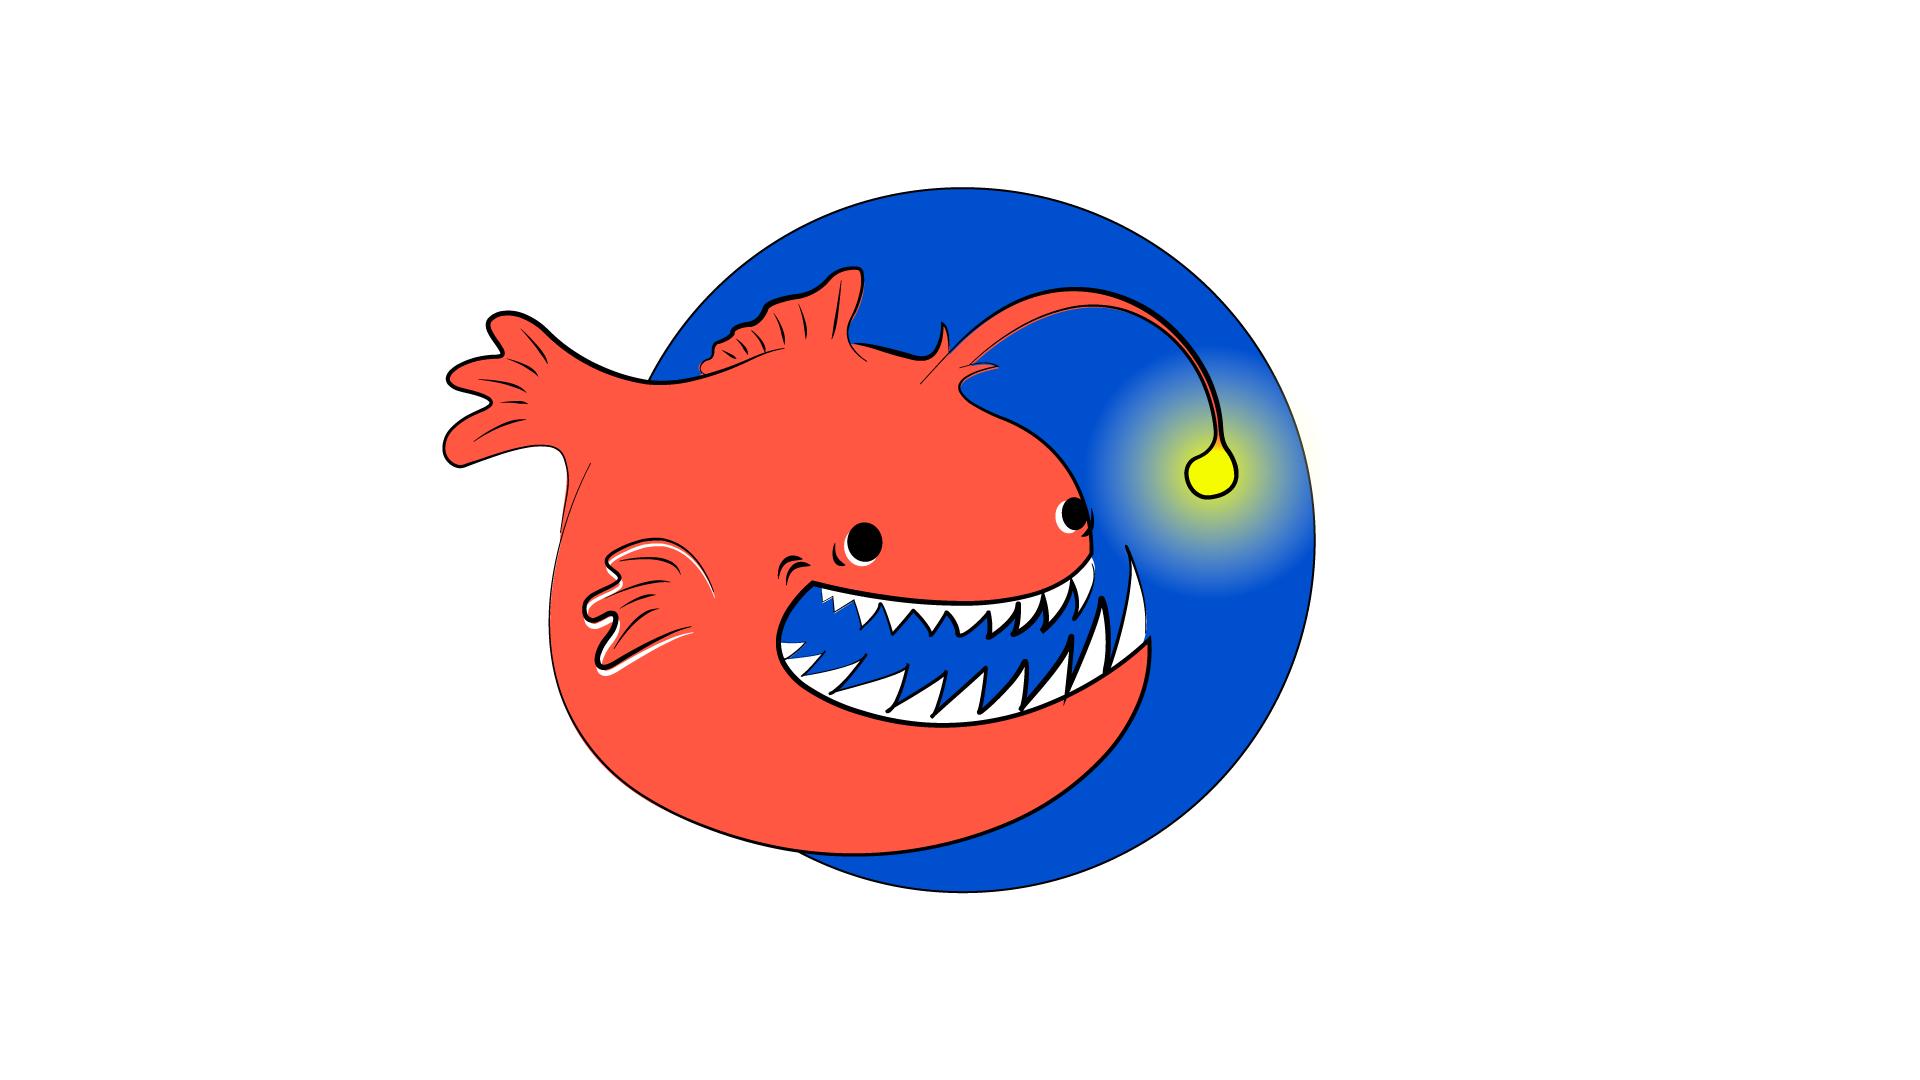 The illuminatio network policy validation anglerfish